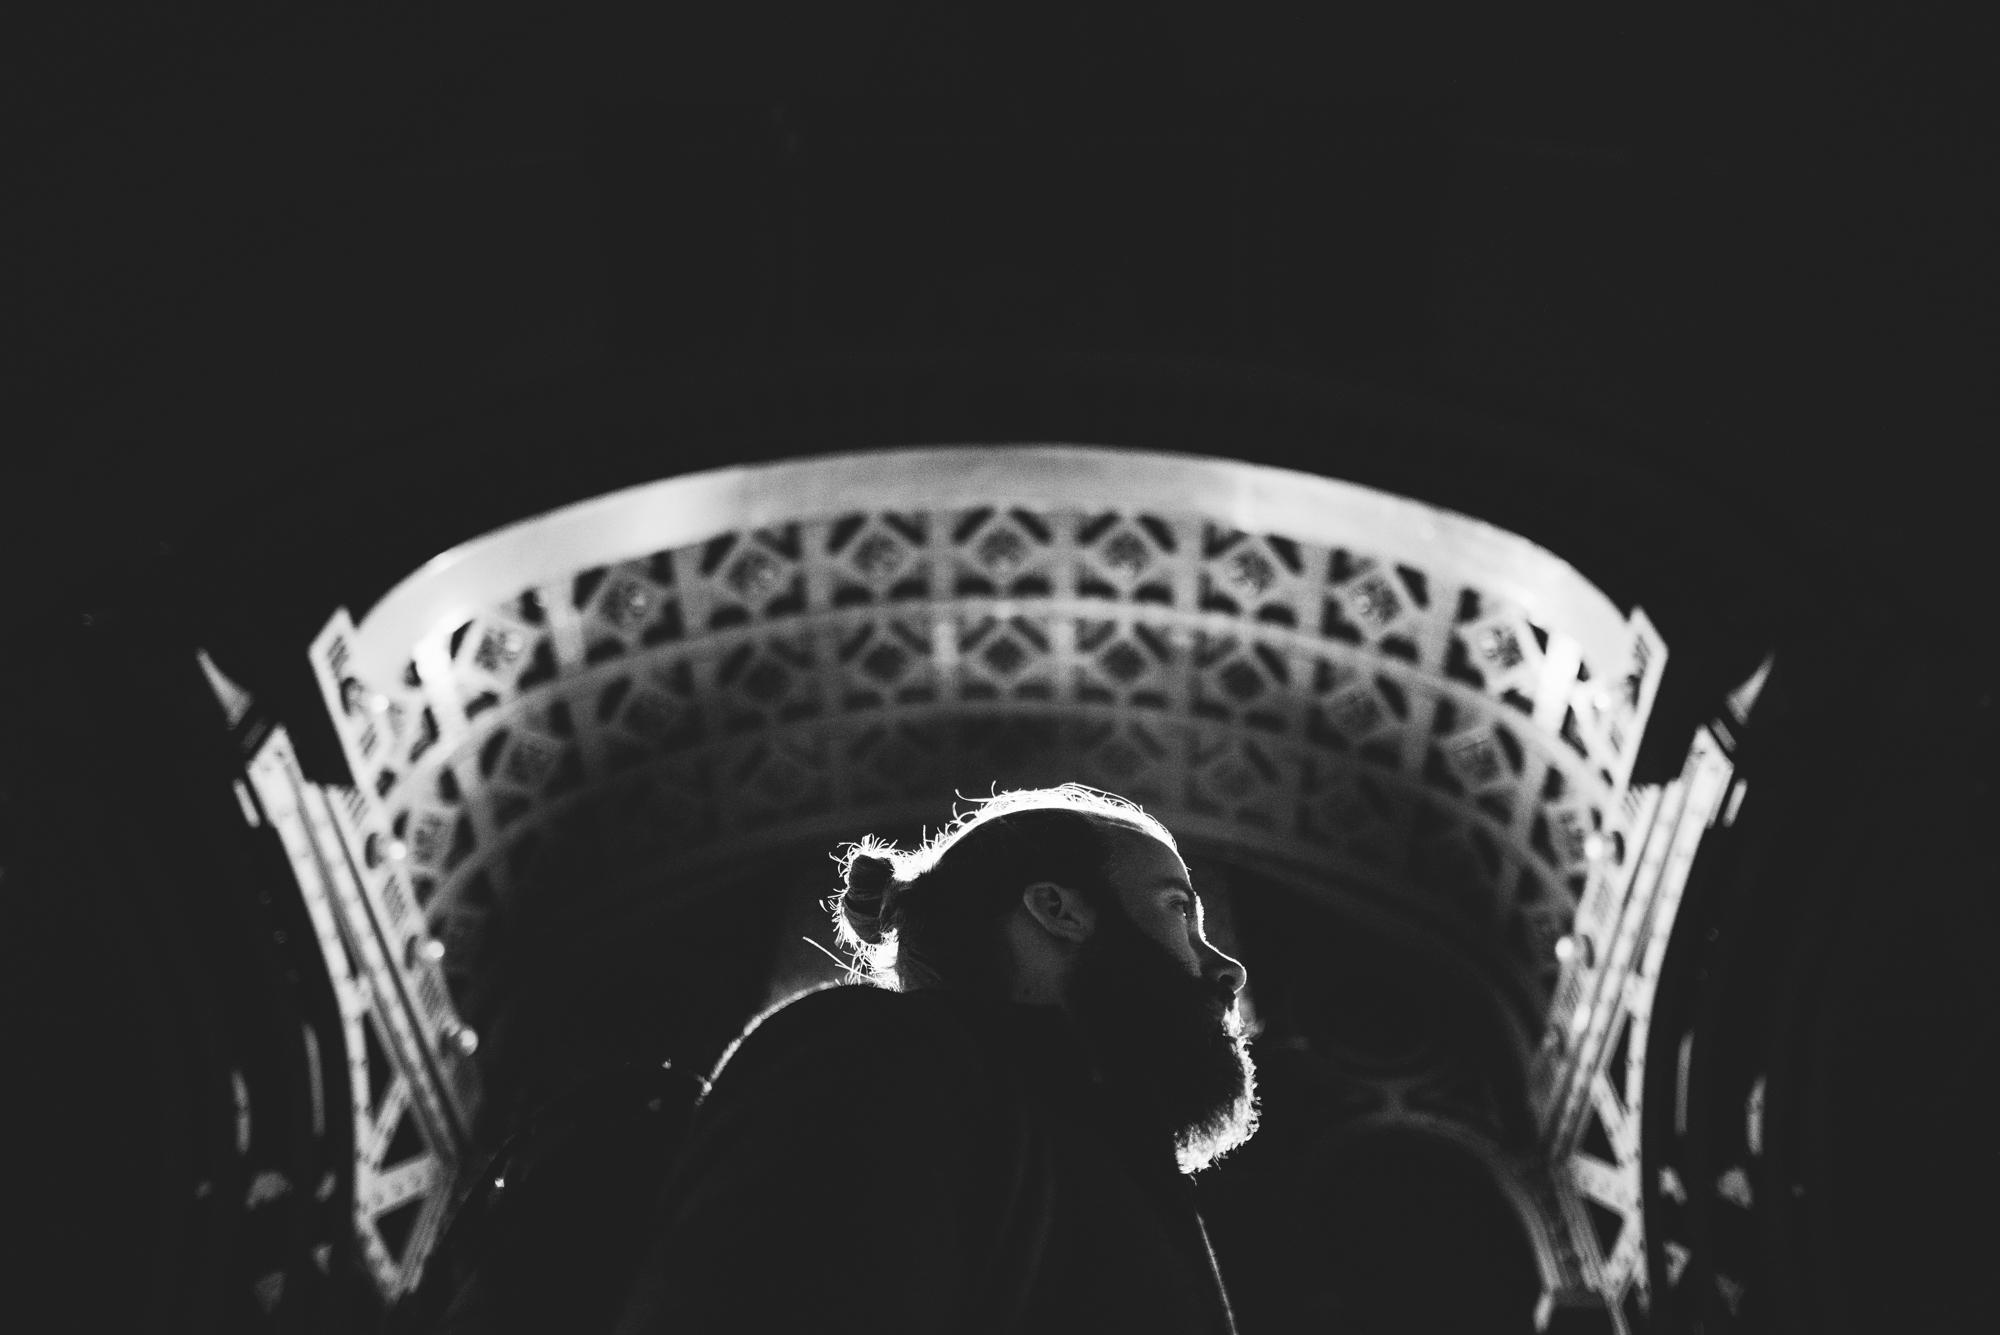 ©The Ryans Photography - NYC Night-025.jpg